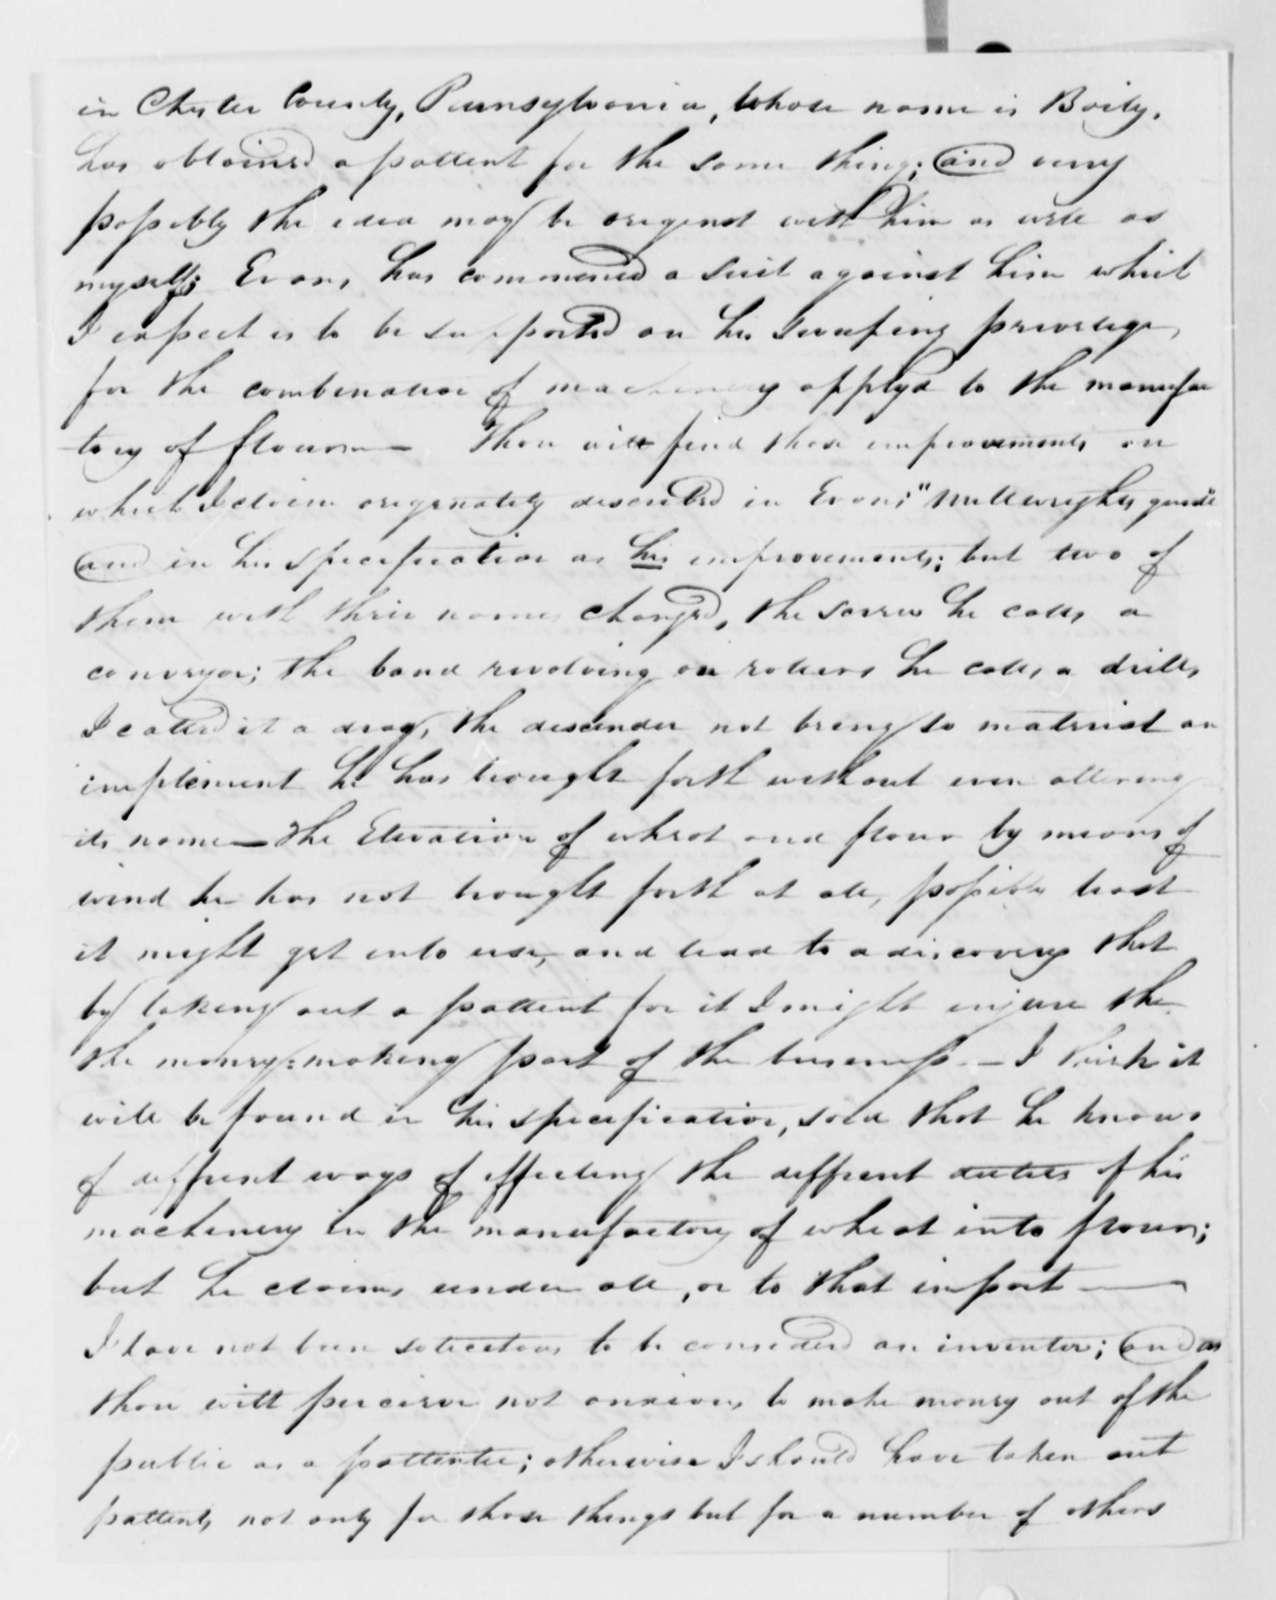 Jonathan Ellicott to Thomas Worthington, August 28, 1813